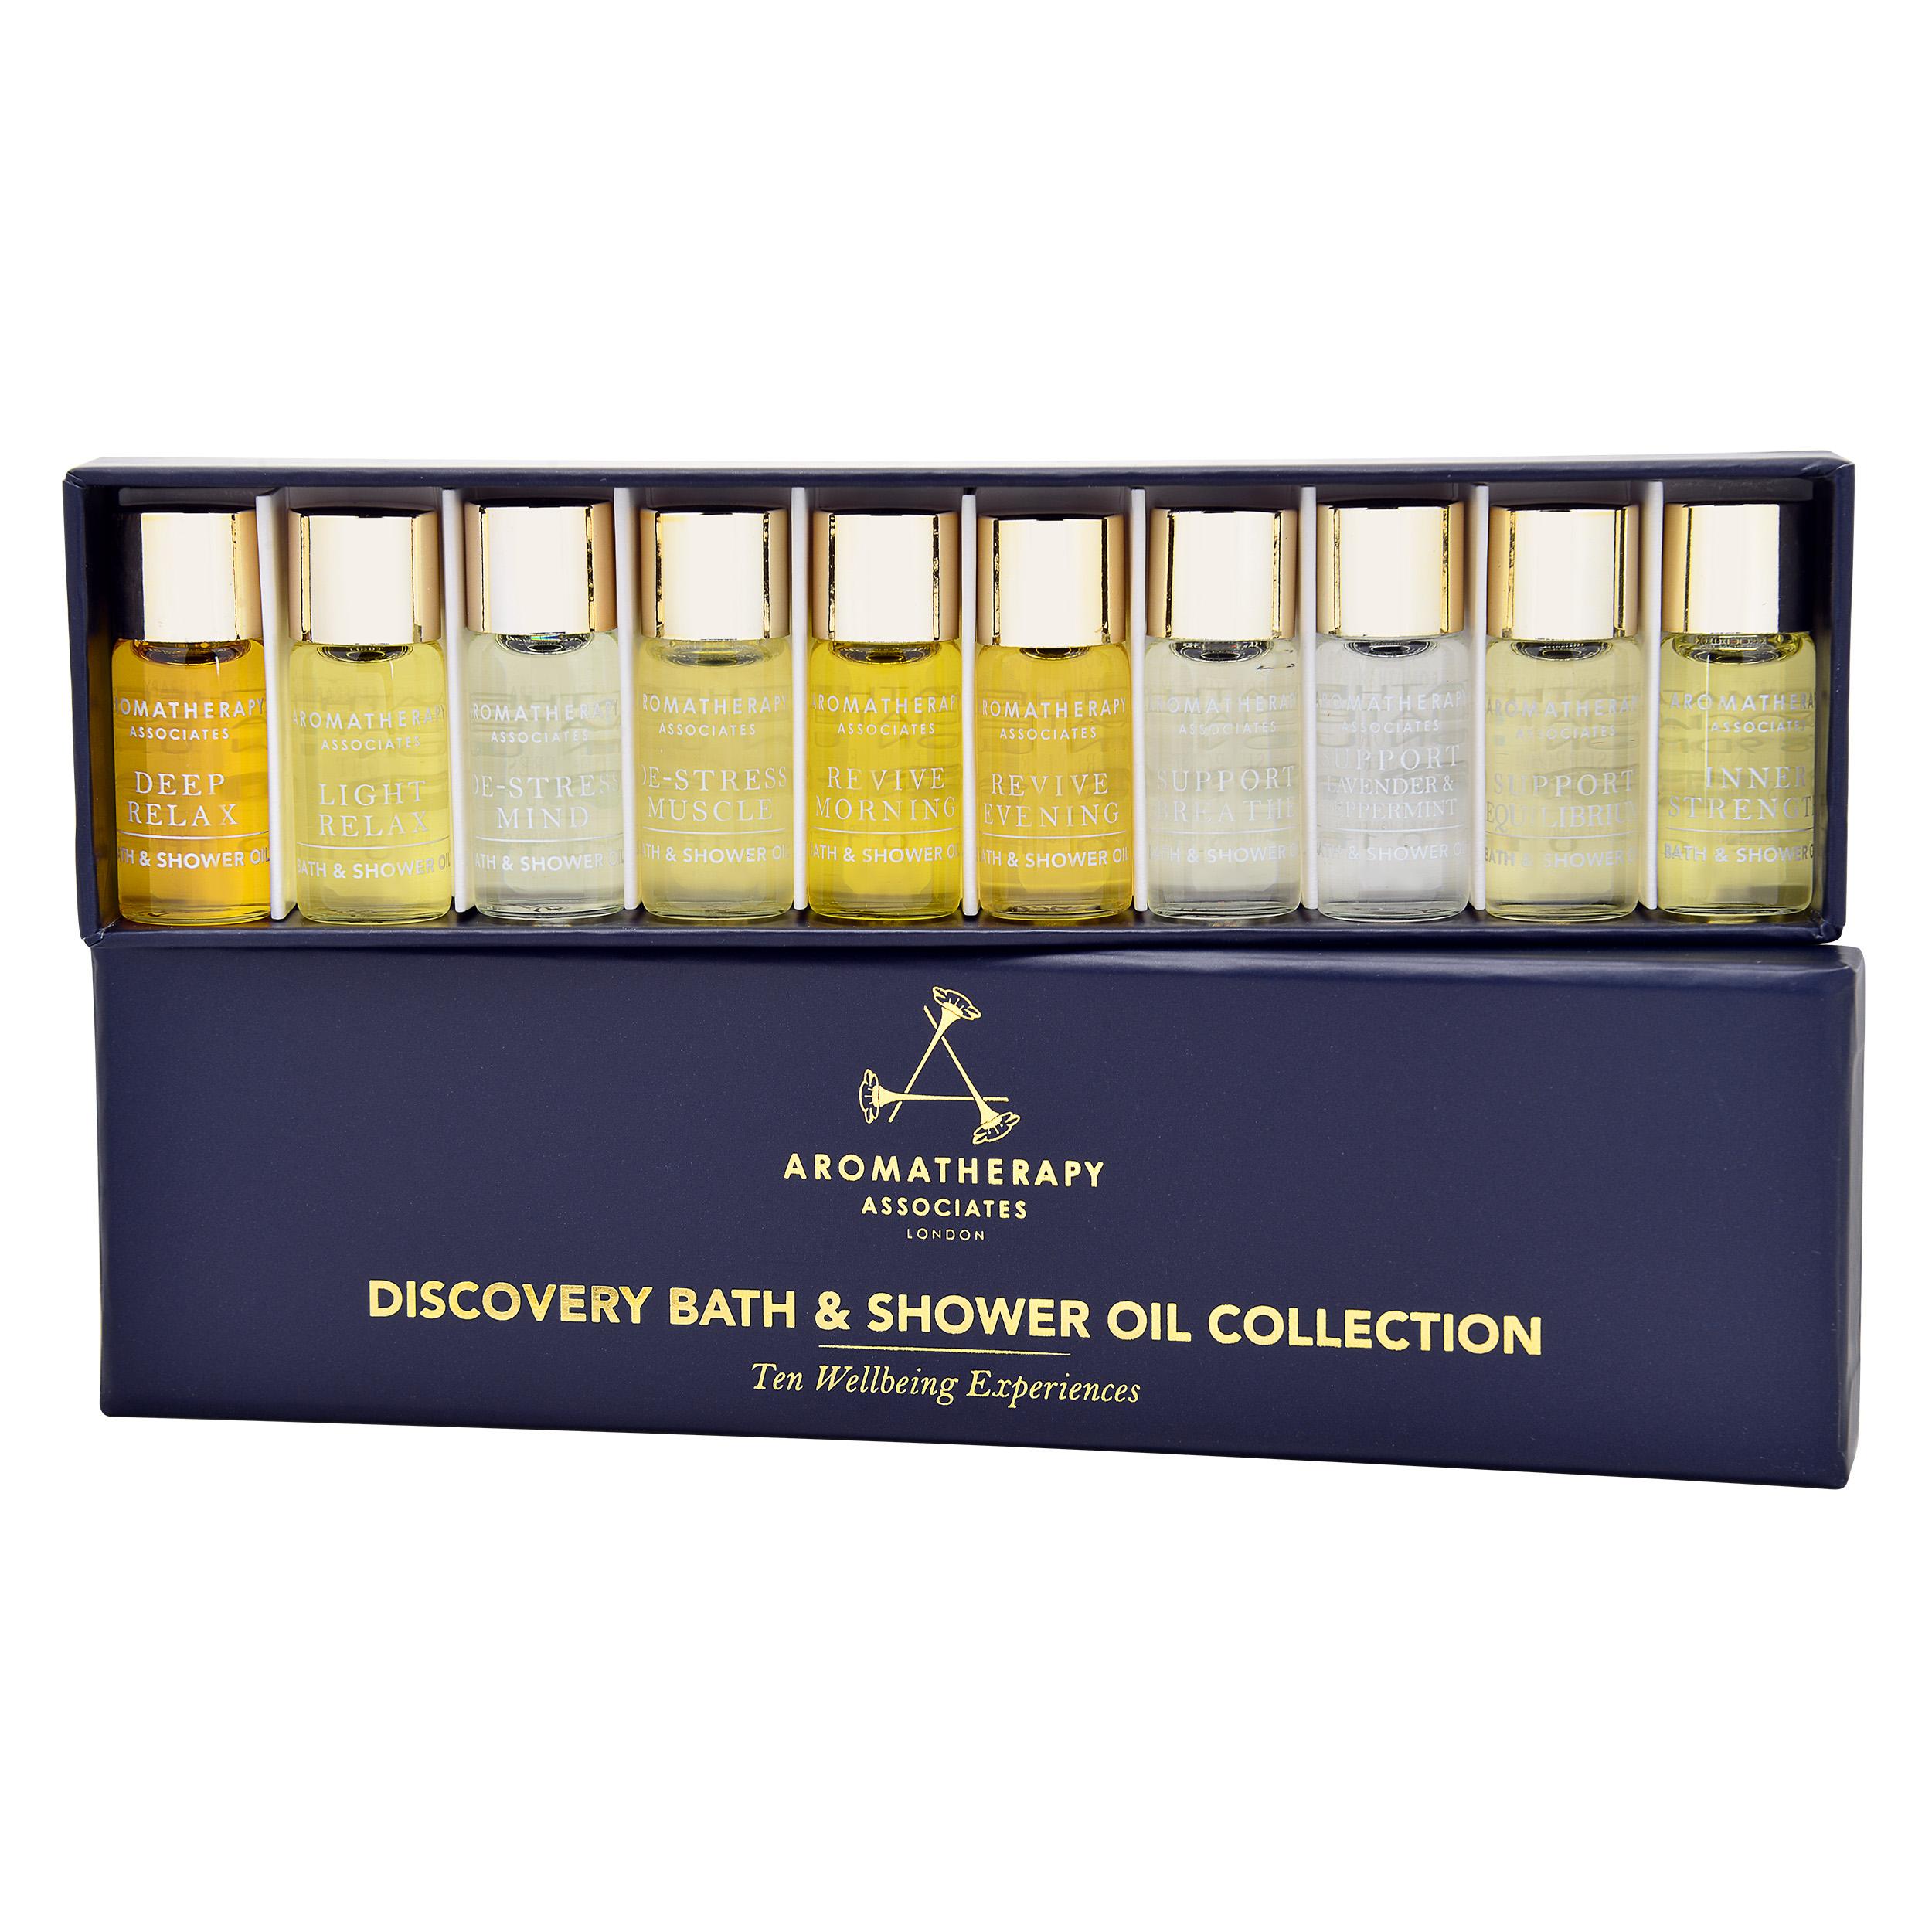 Aromatherapy Associates  Miniature Bath & Shower Oil Collection 10 x 0.1oz, 10 x 3ml